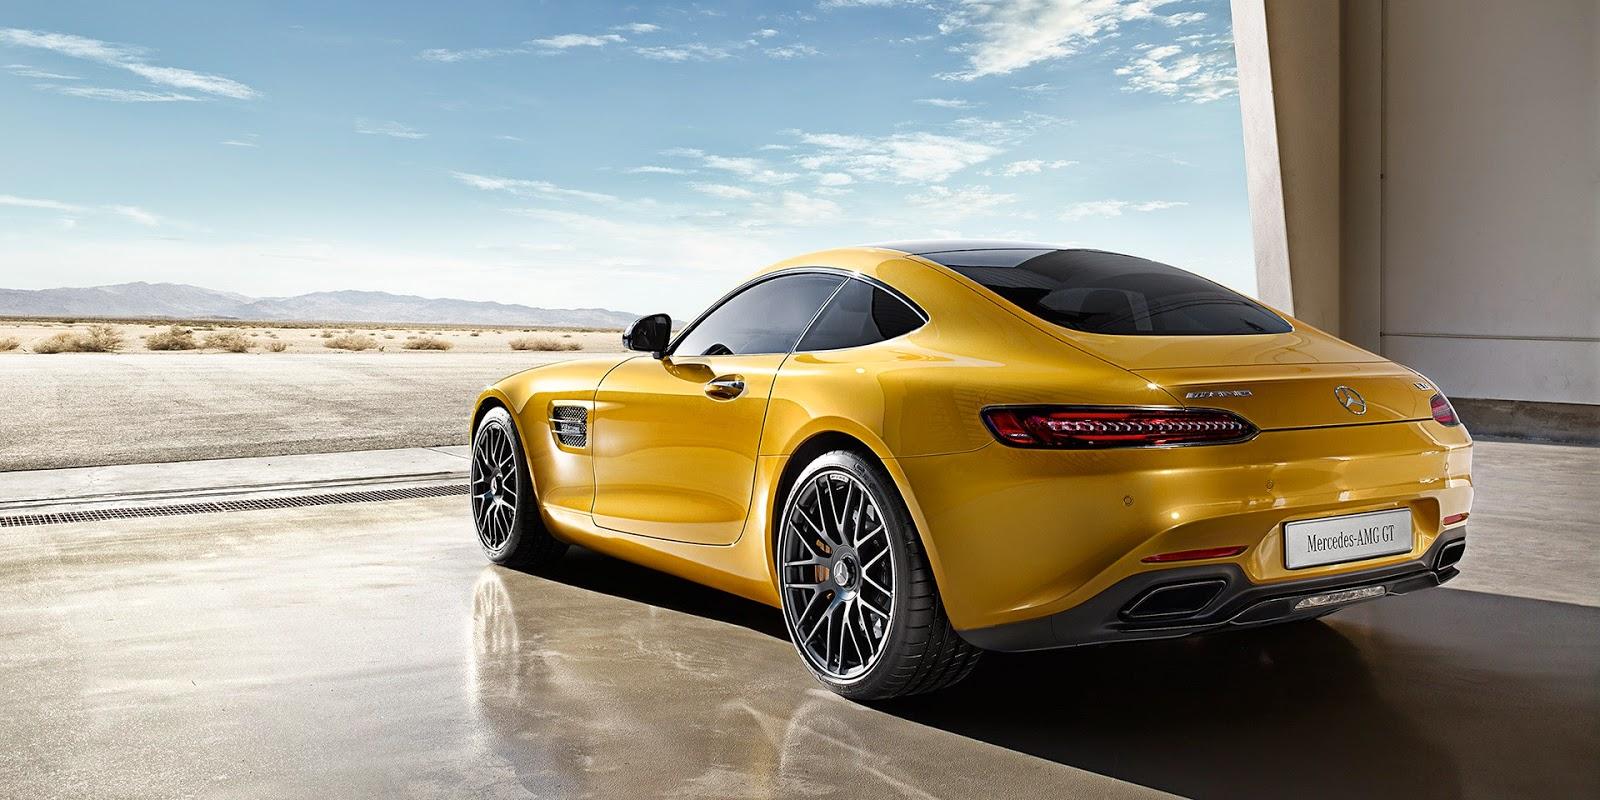 mercedes amg gt To supercar της Mercedes AMG GT στην πίστα του Ώστιν (vid) Mercedes AMG, Mercedes AMG GT, videos